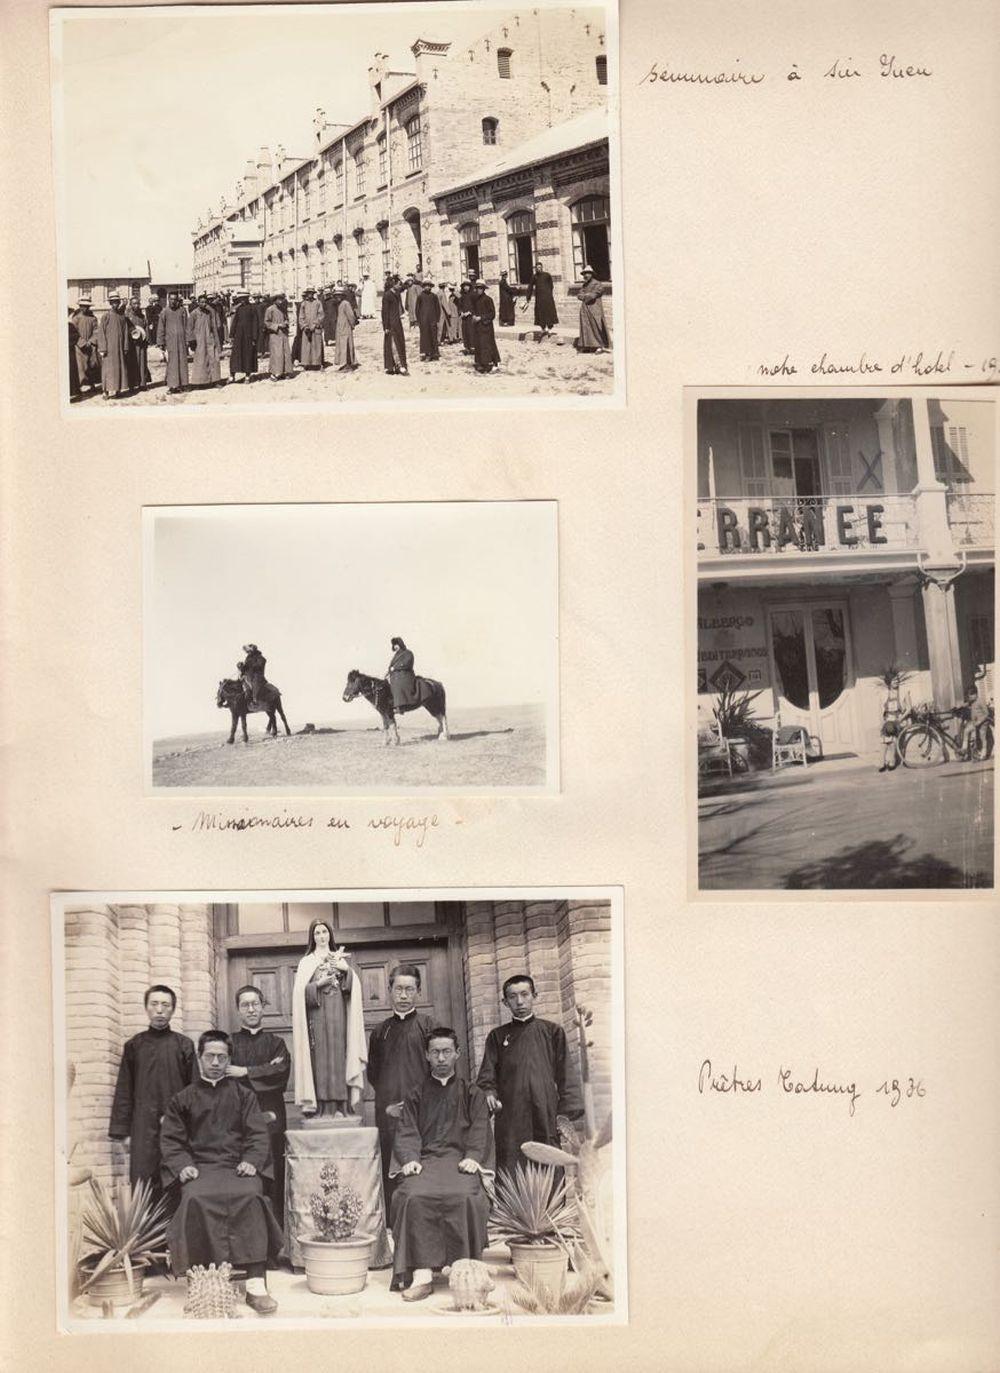 [CHINE] [MISSION DE SIN-JUEN 1931-1939]. Cahier comptan